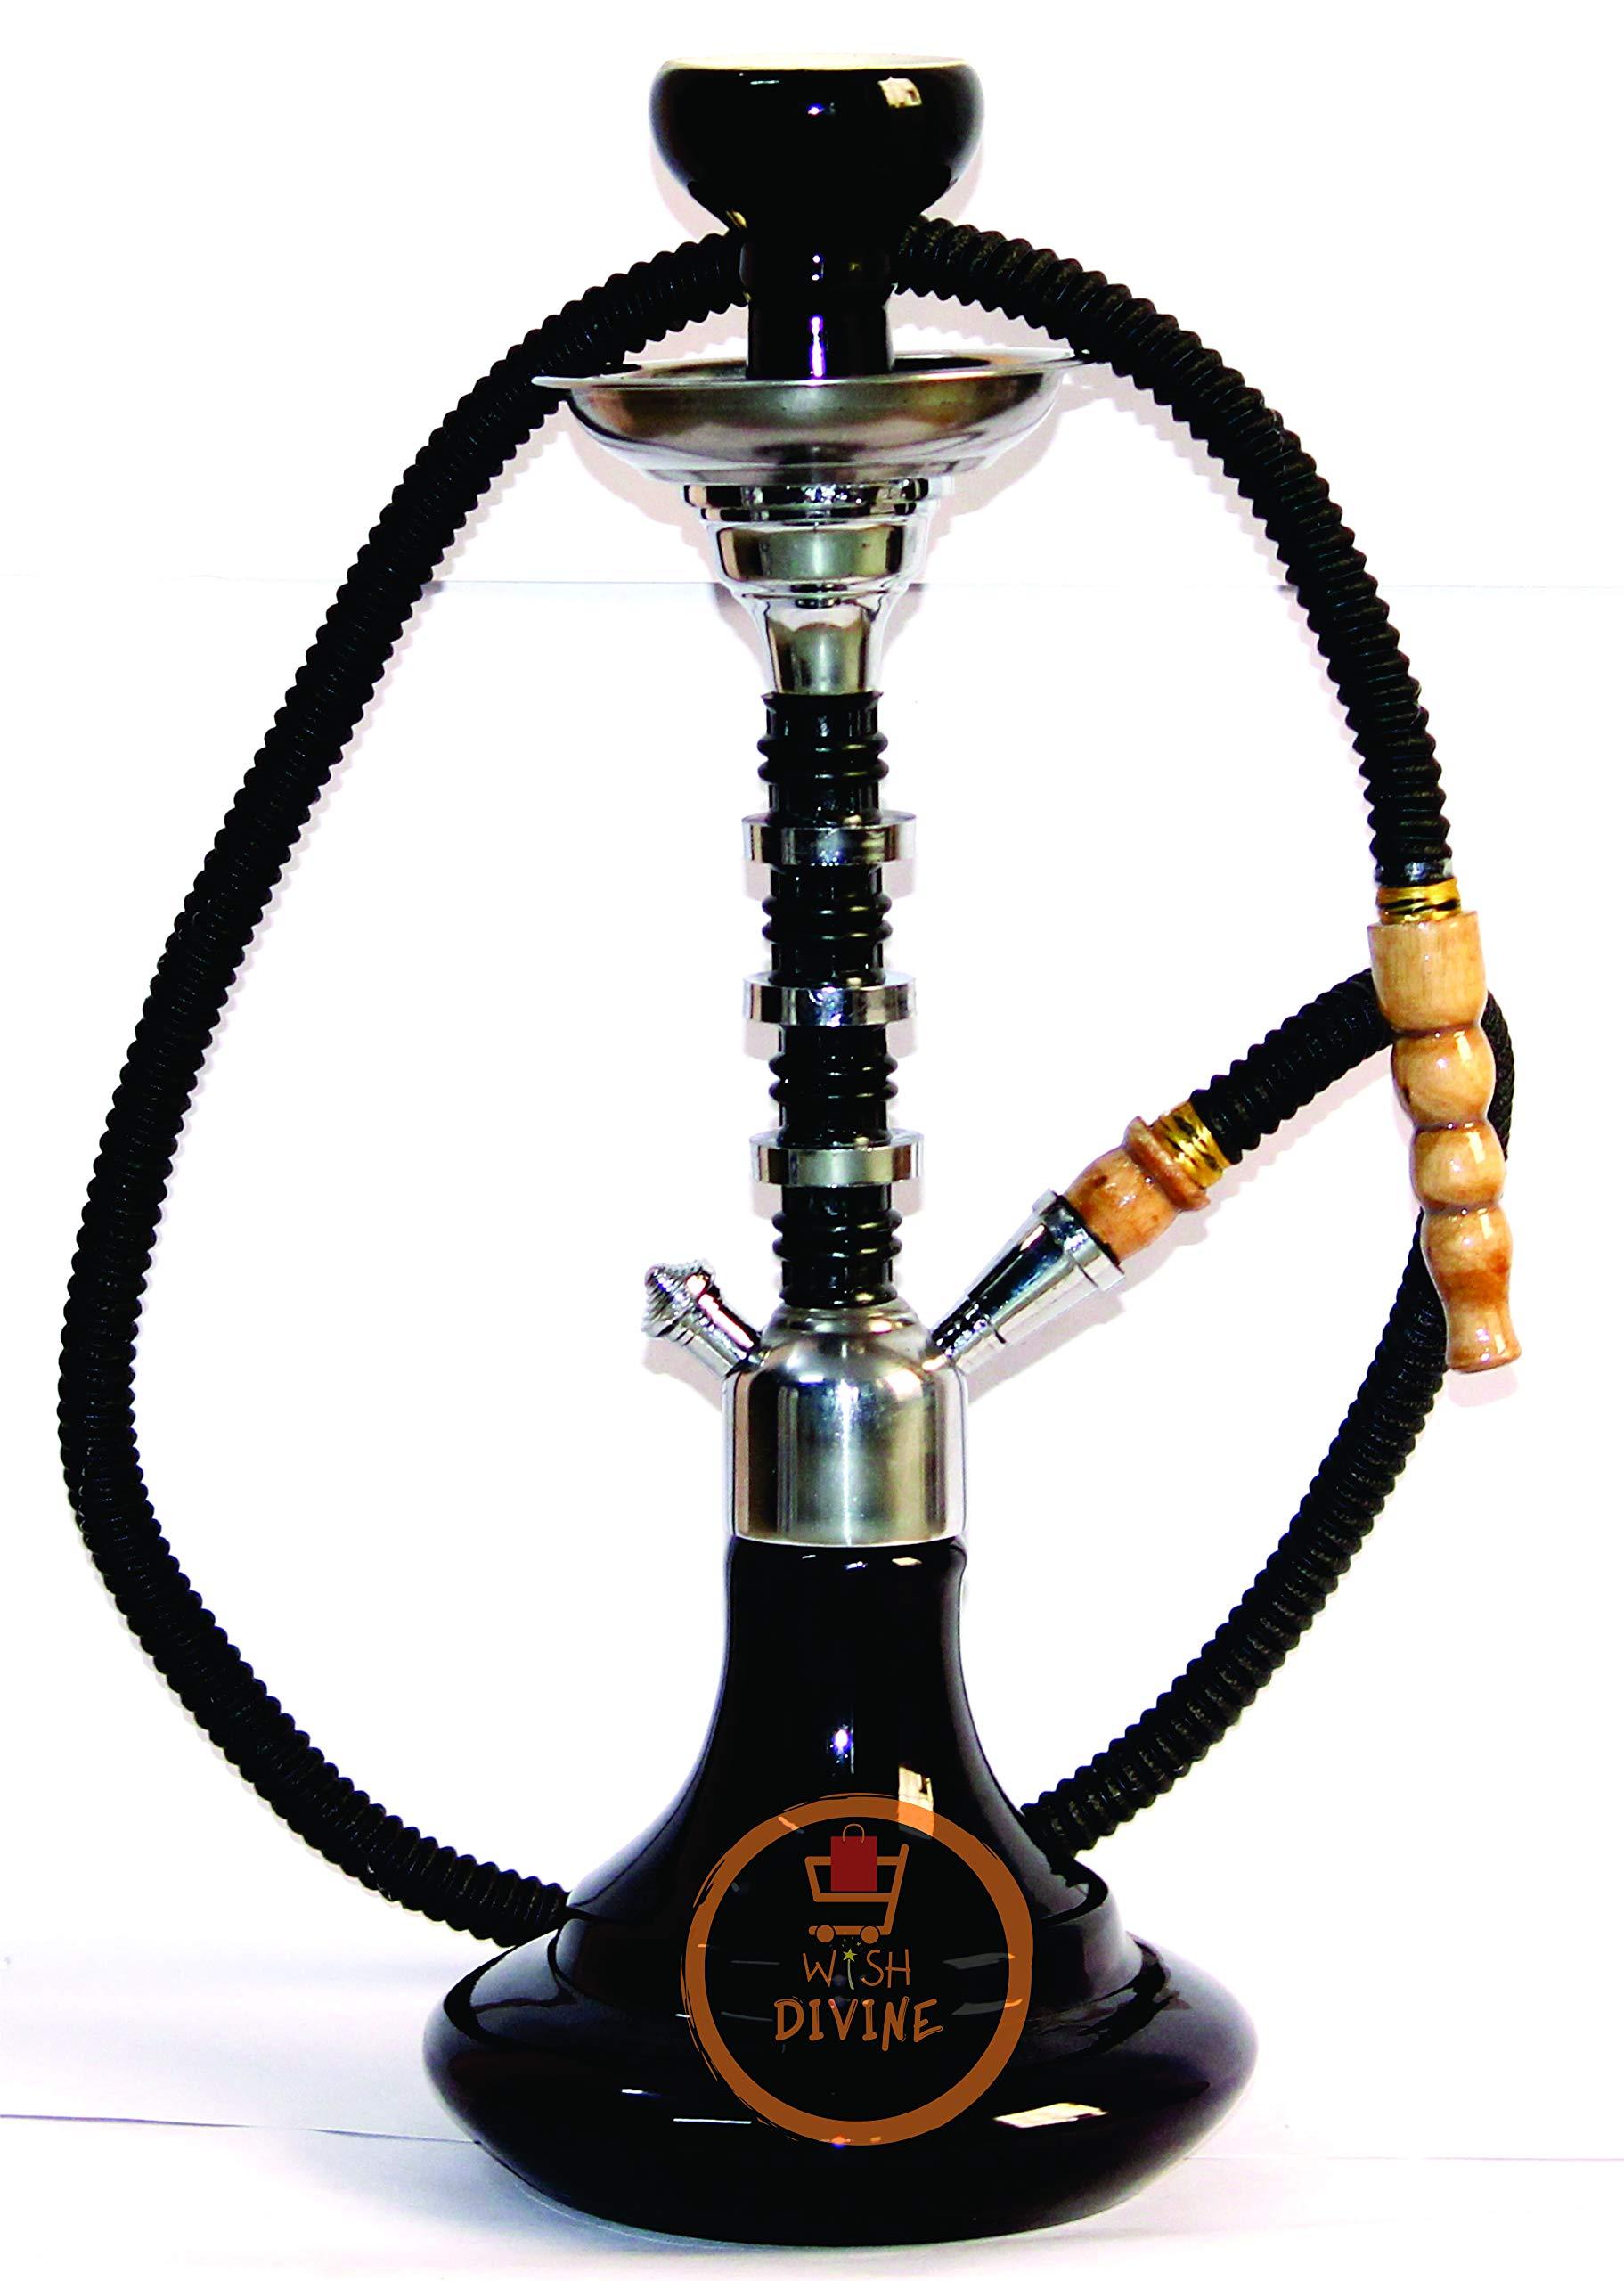 Wish Divine Glass Hookah Pot (Black)